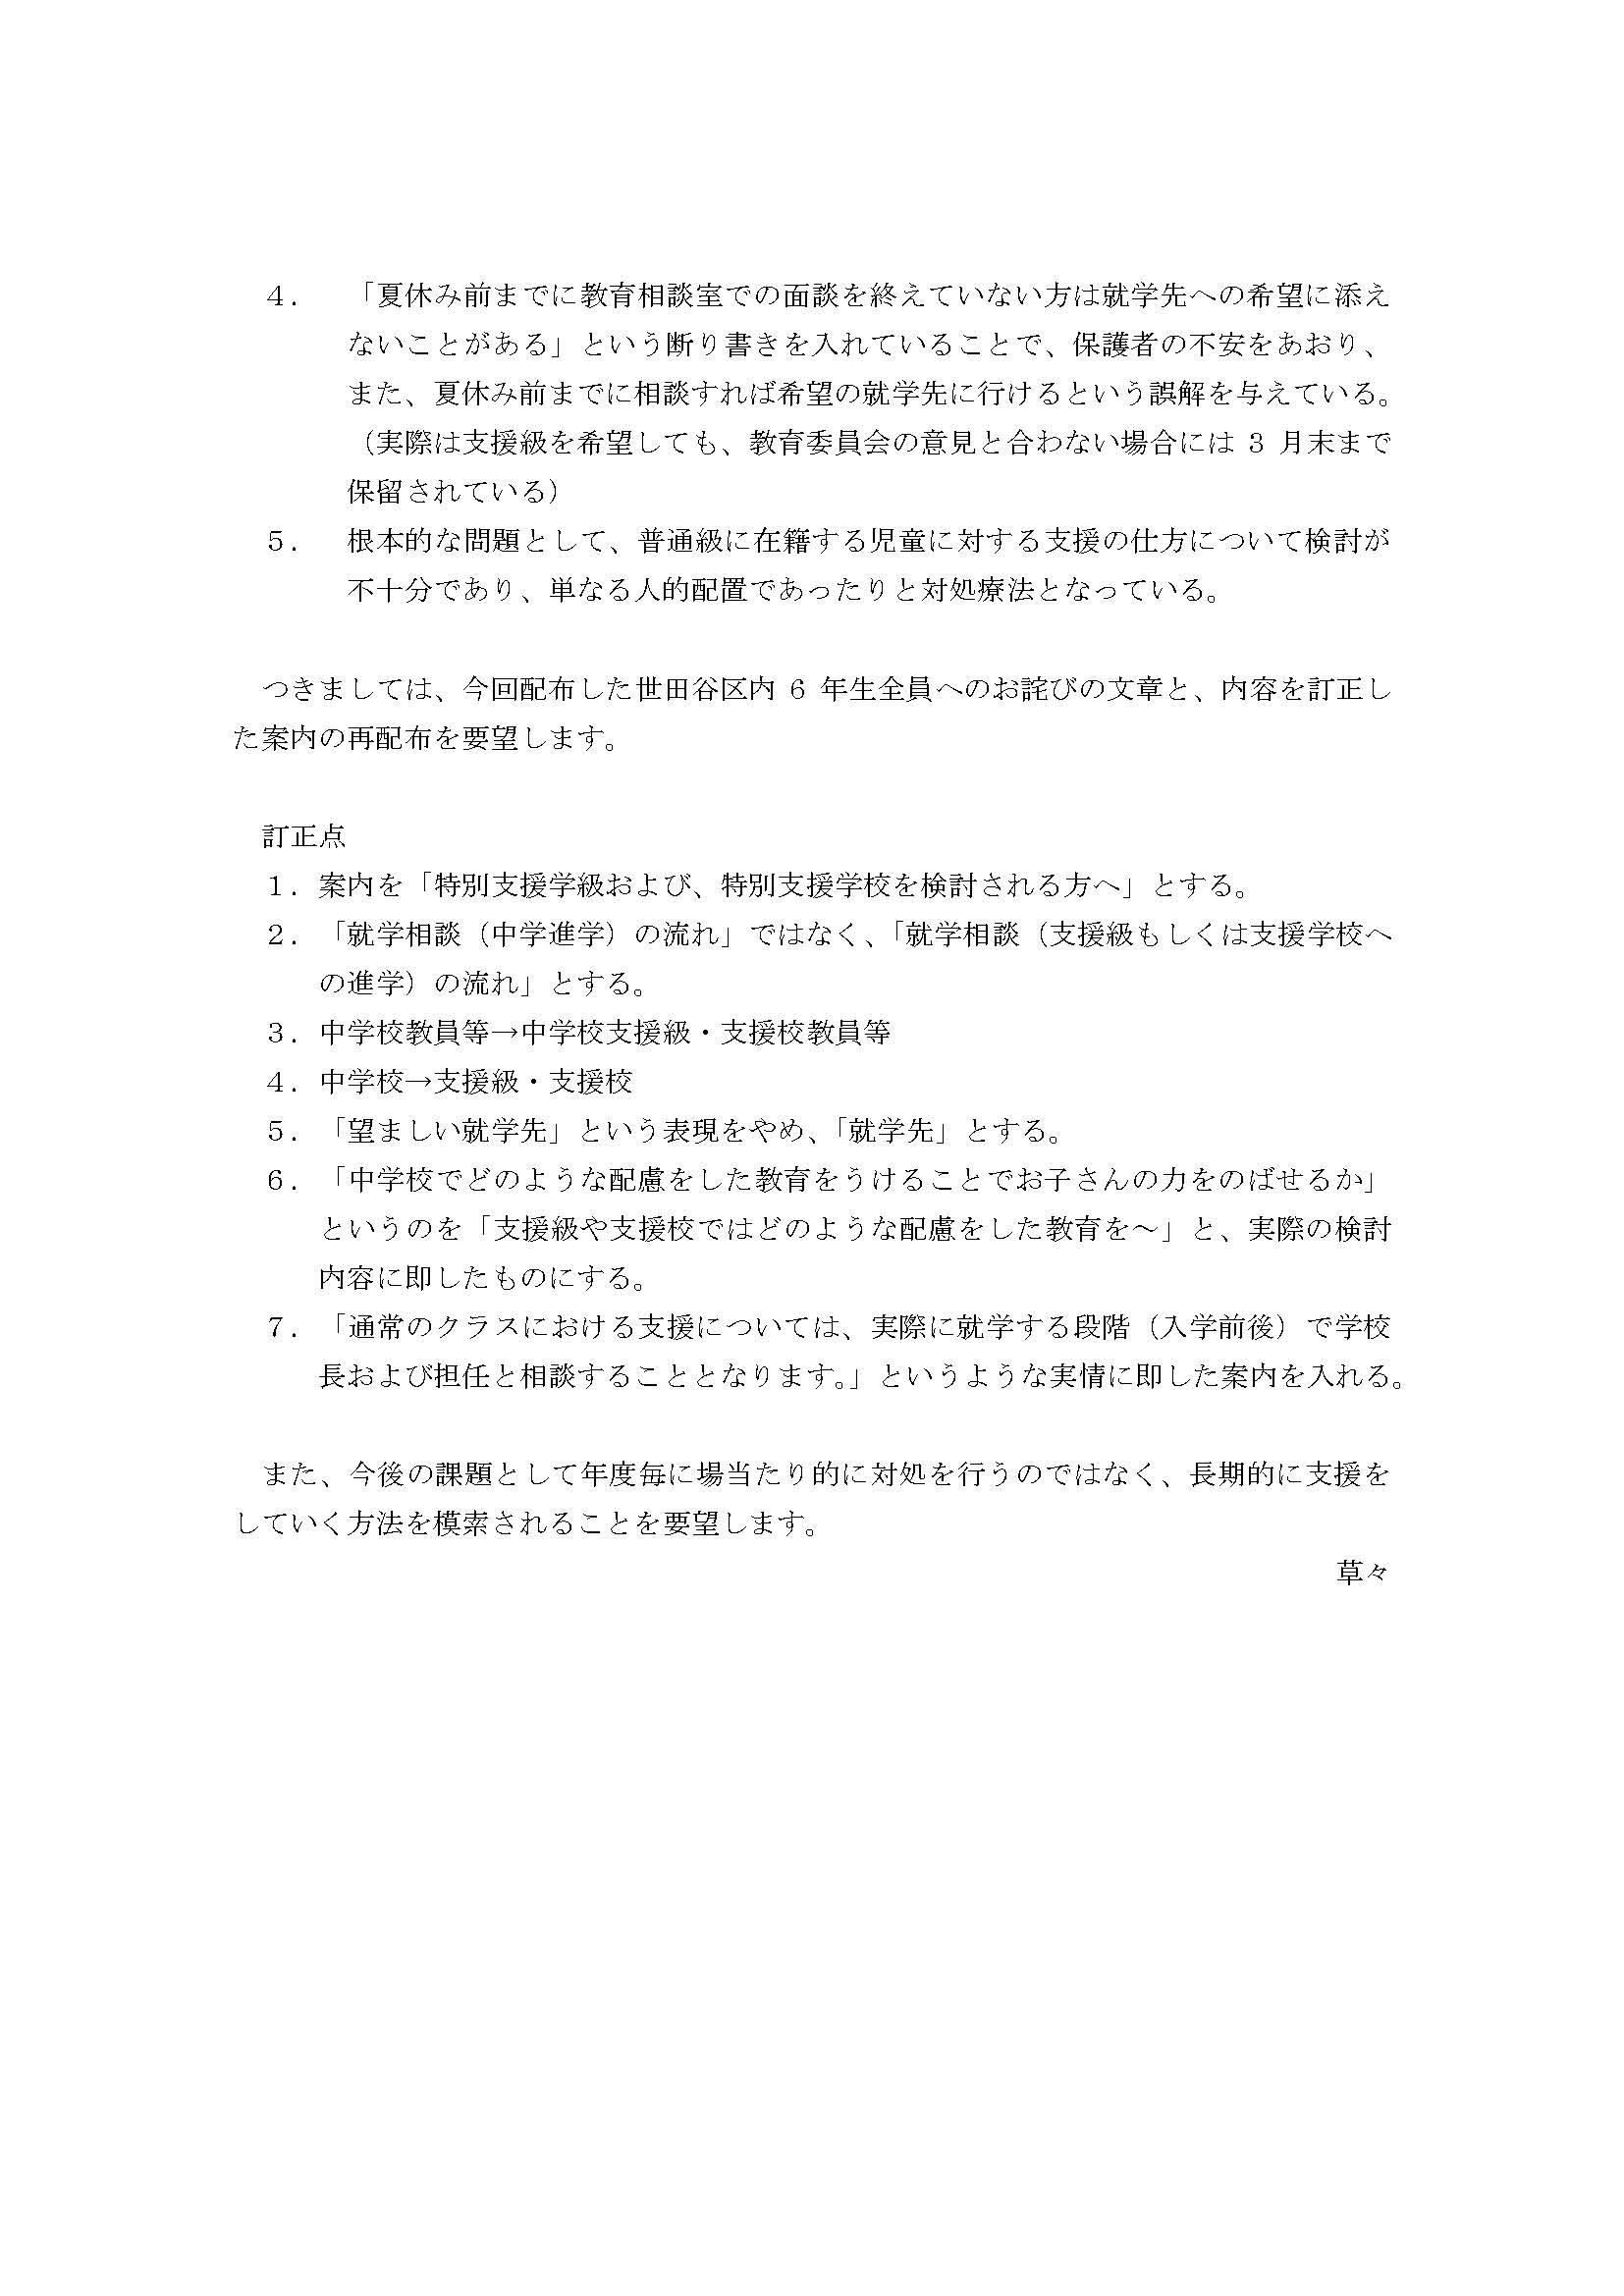 平成28年4月25日_ページ_2